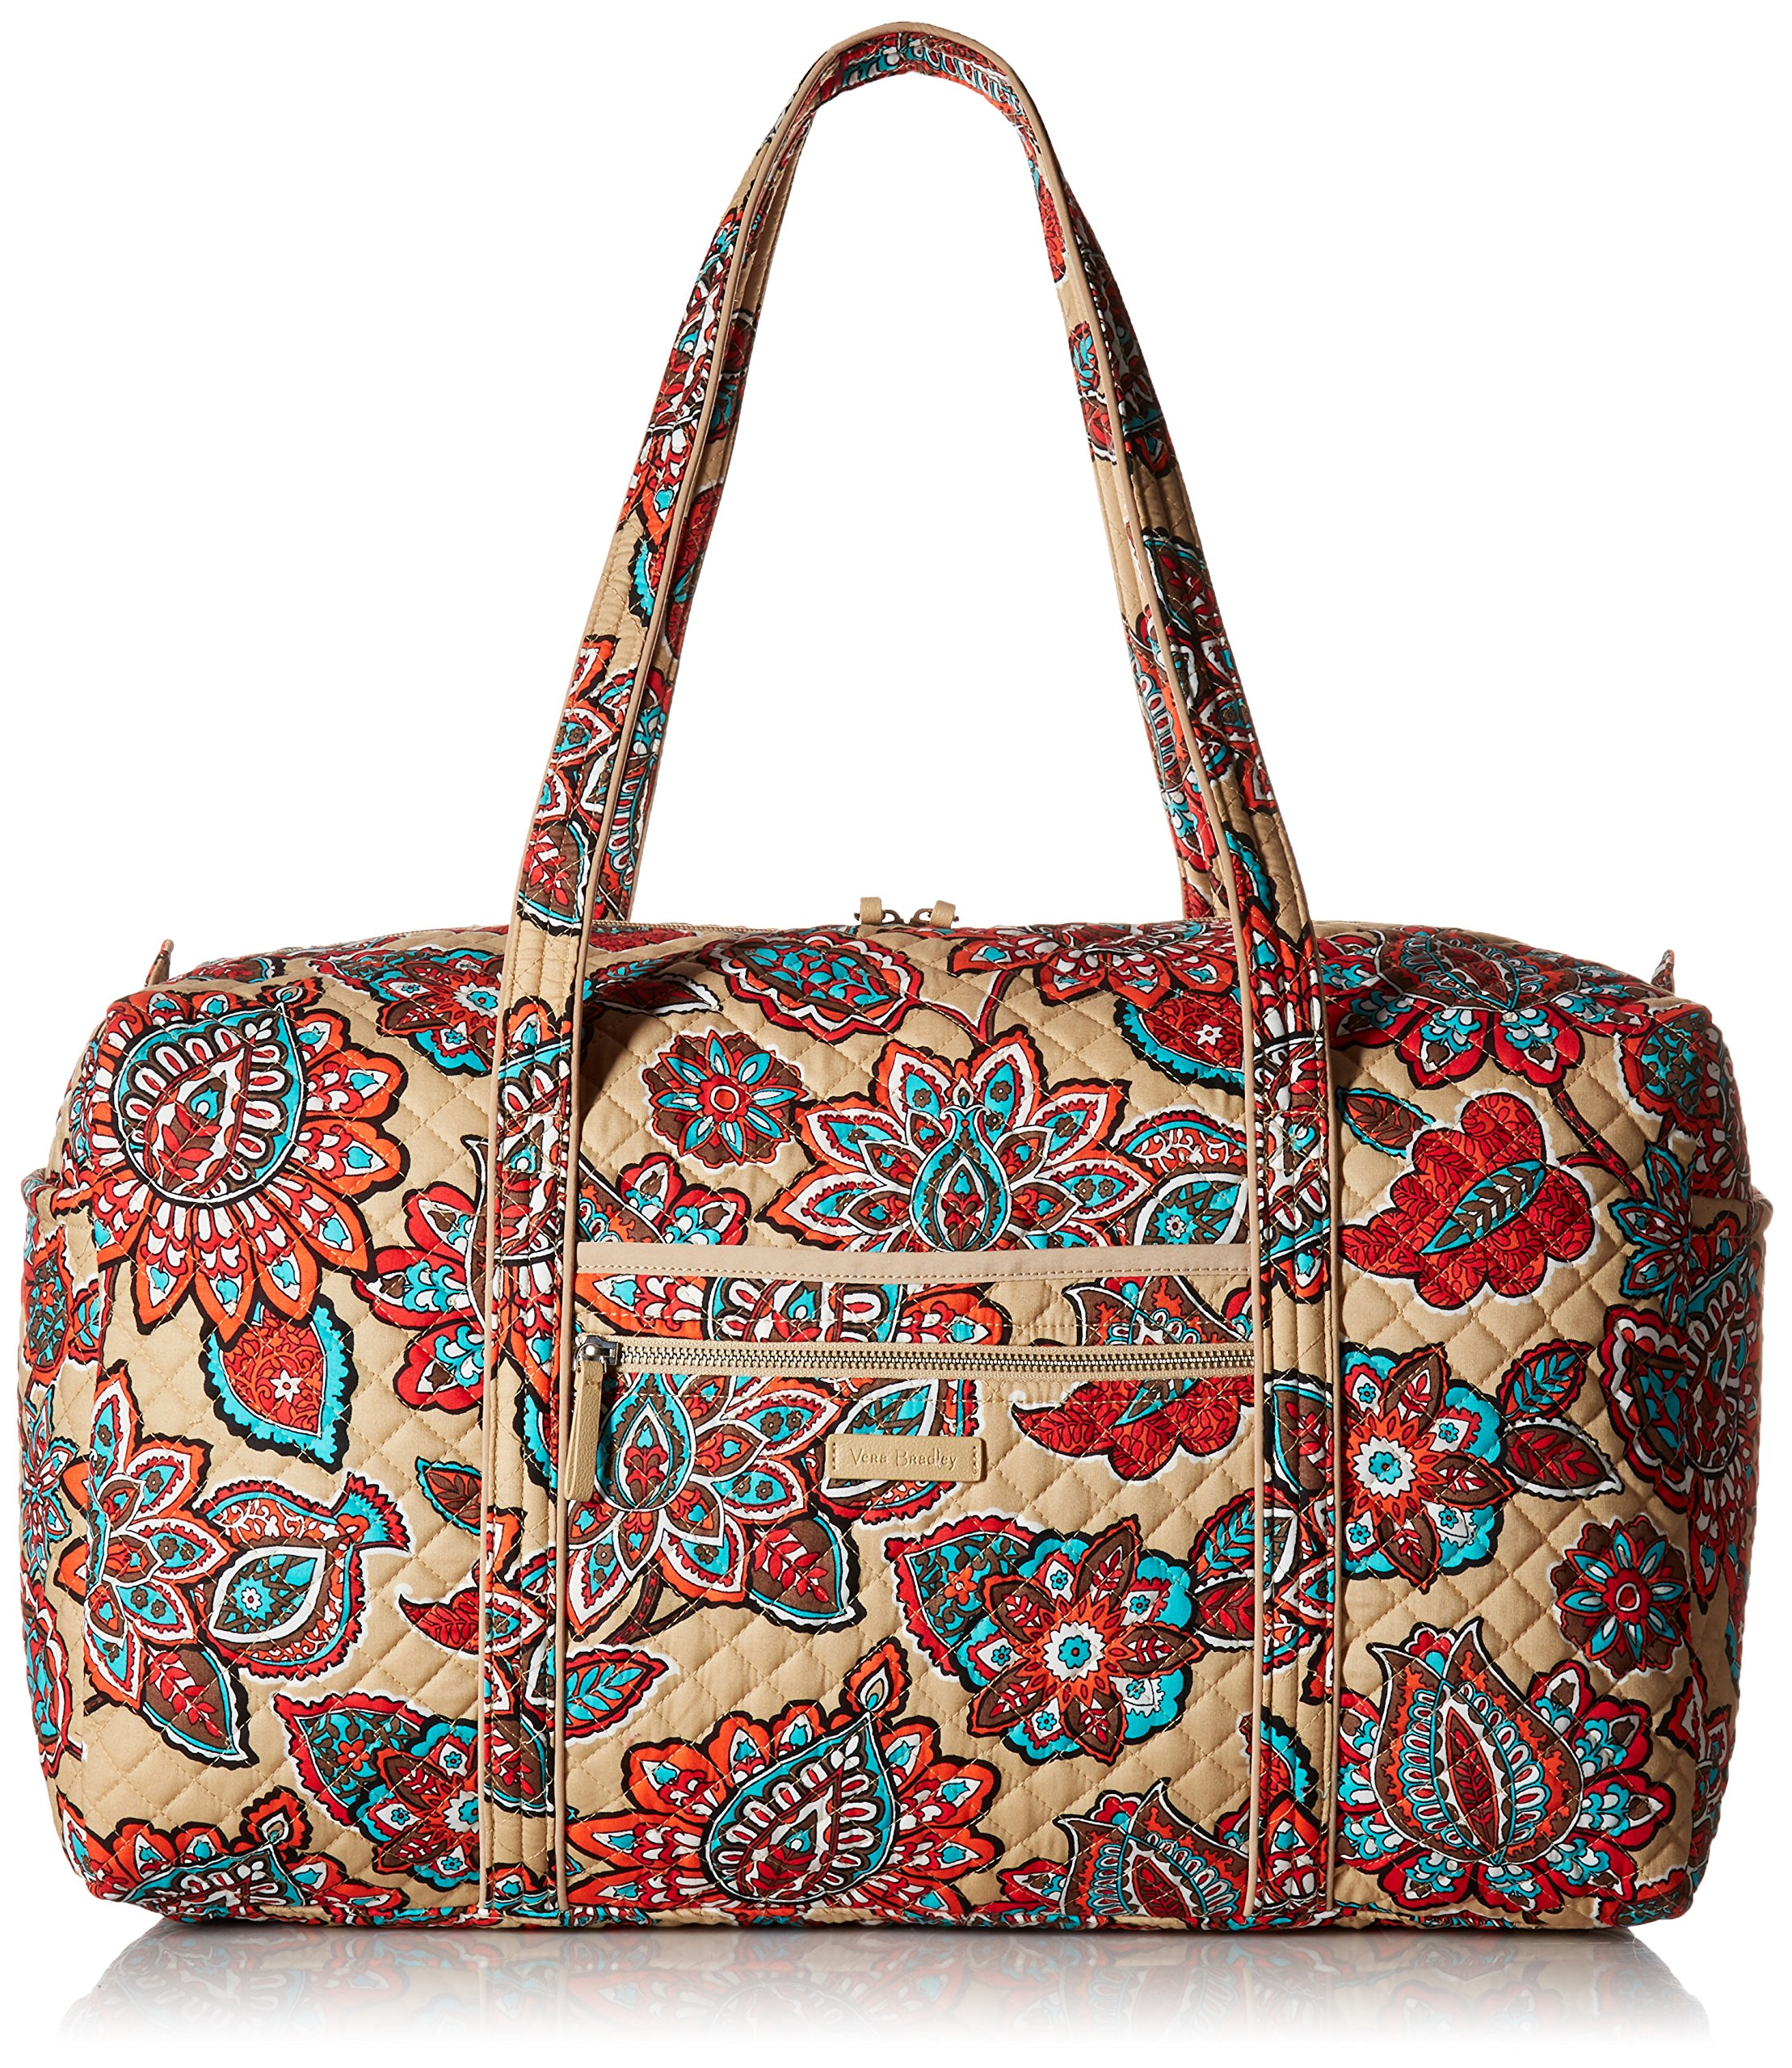 Vera Bradley Iconic Large Travel Duffel, Desert Floral, Desert Floral, One Size